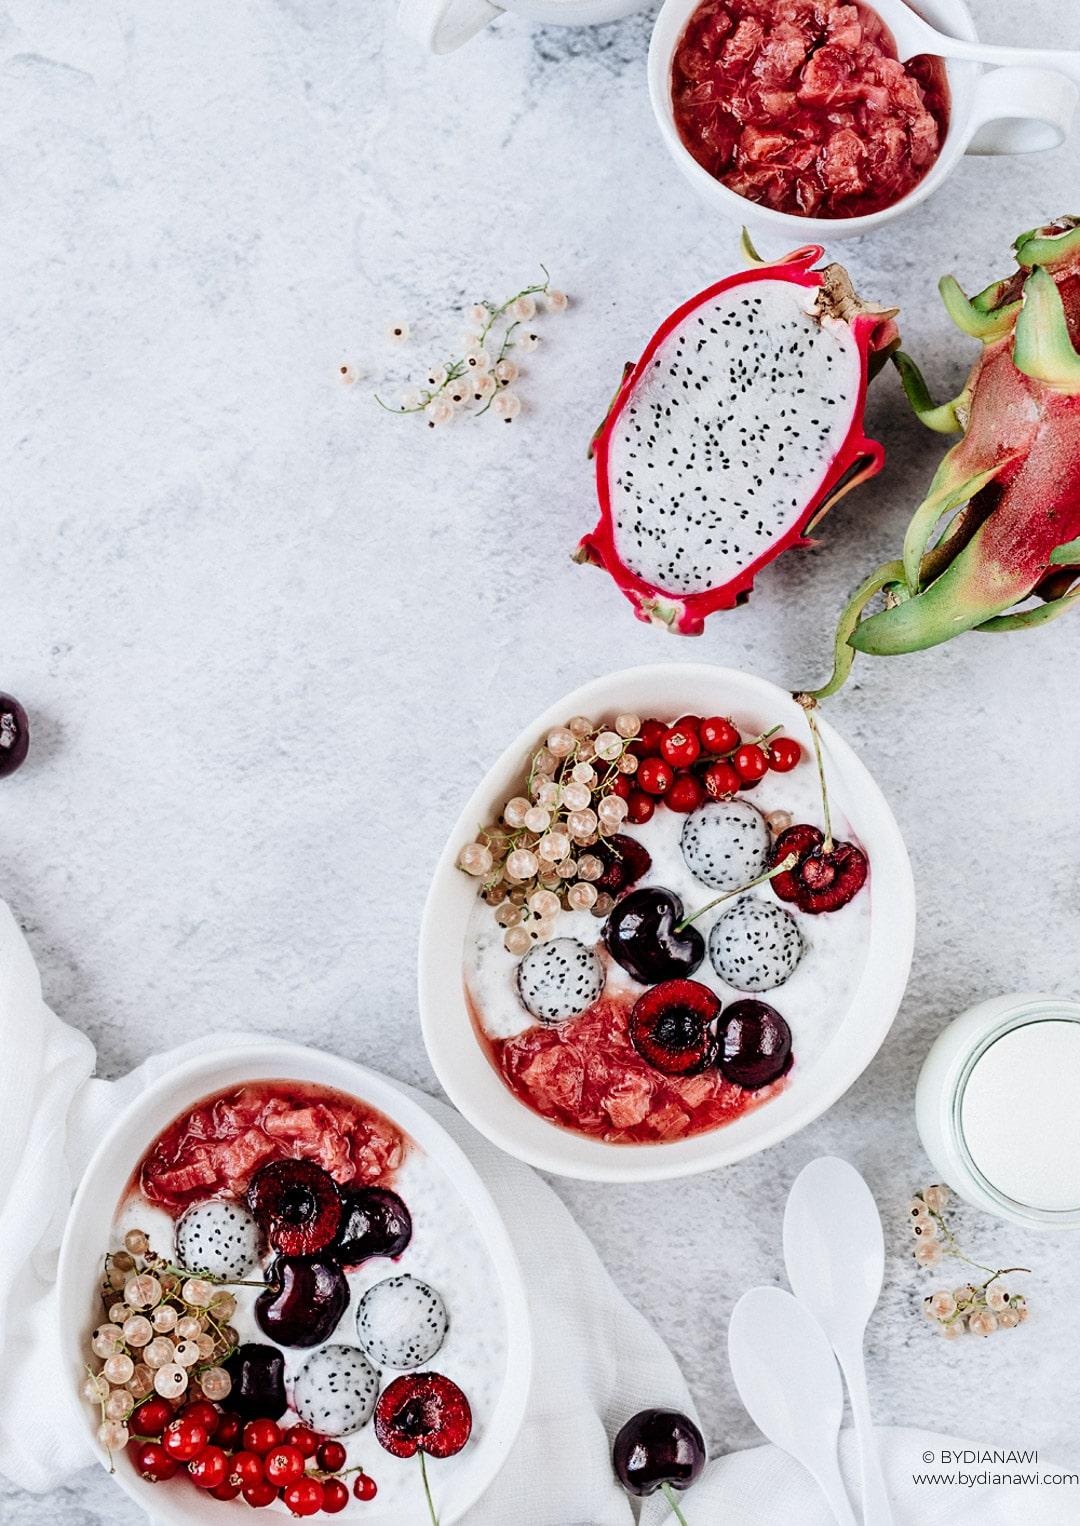 rabarberkompot, opskrifter med rabarber, morgenmad